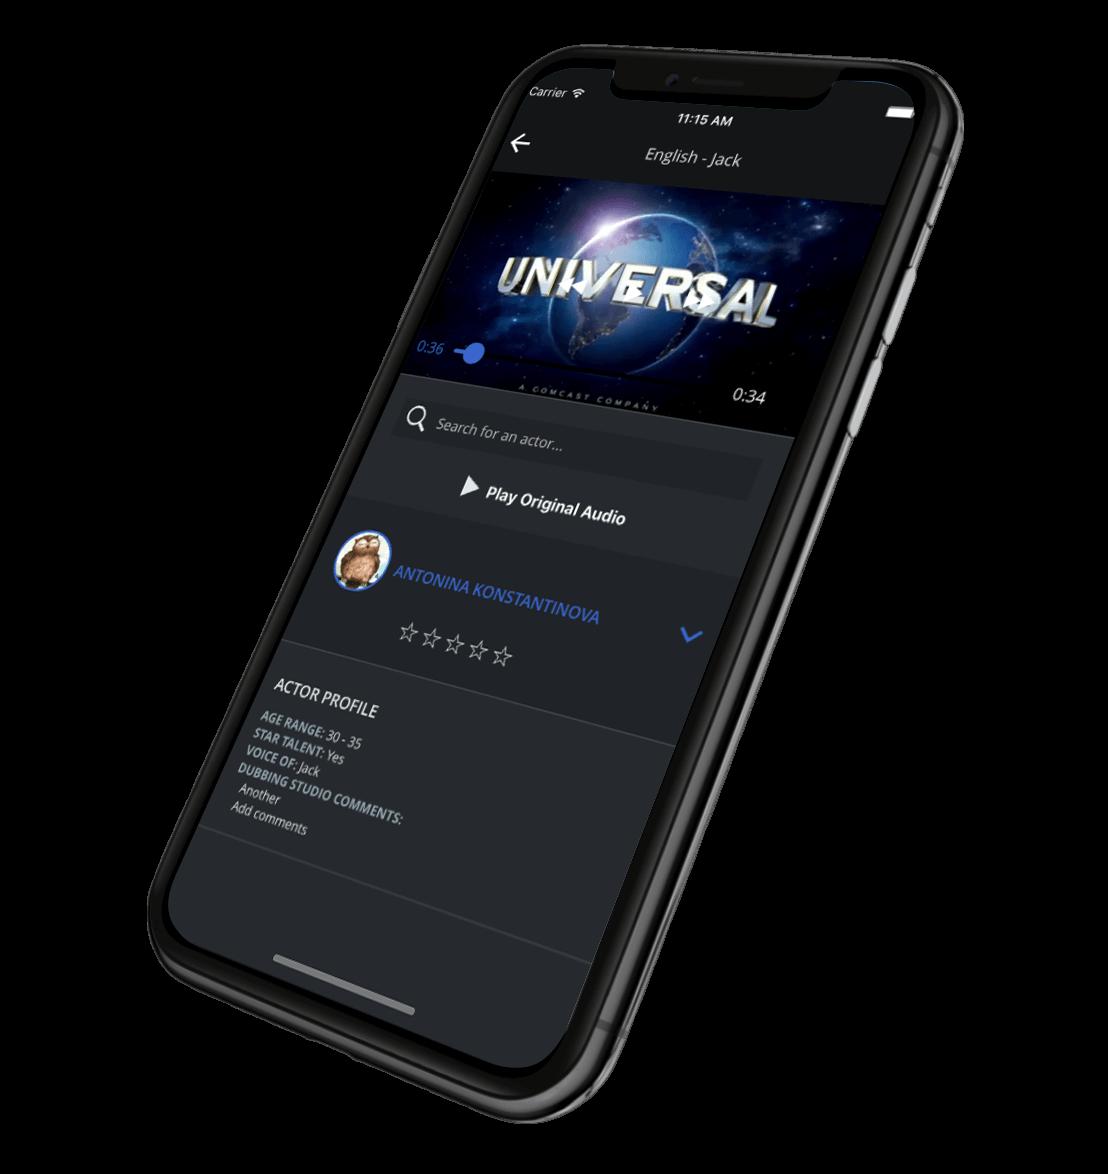 Casting-Mobile vision